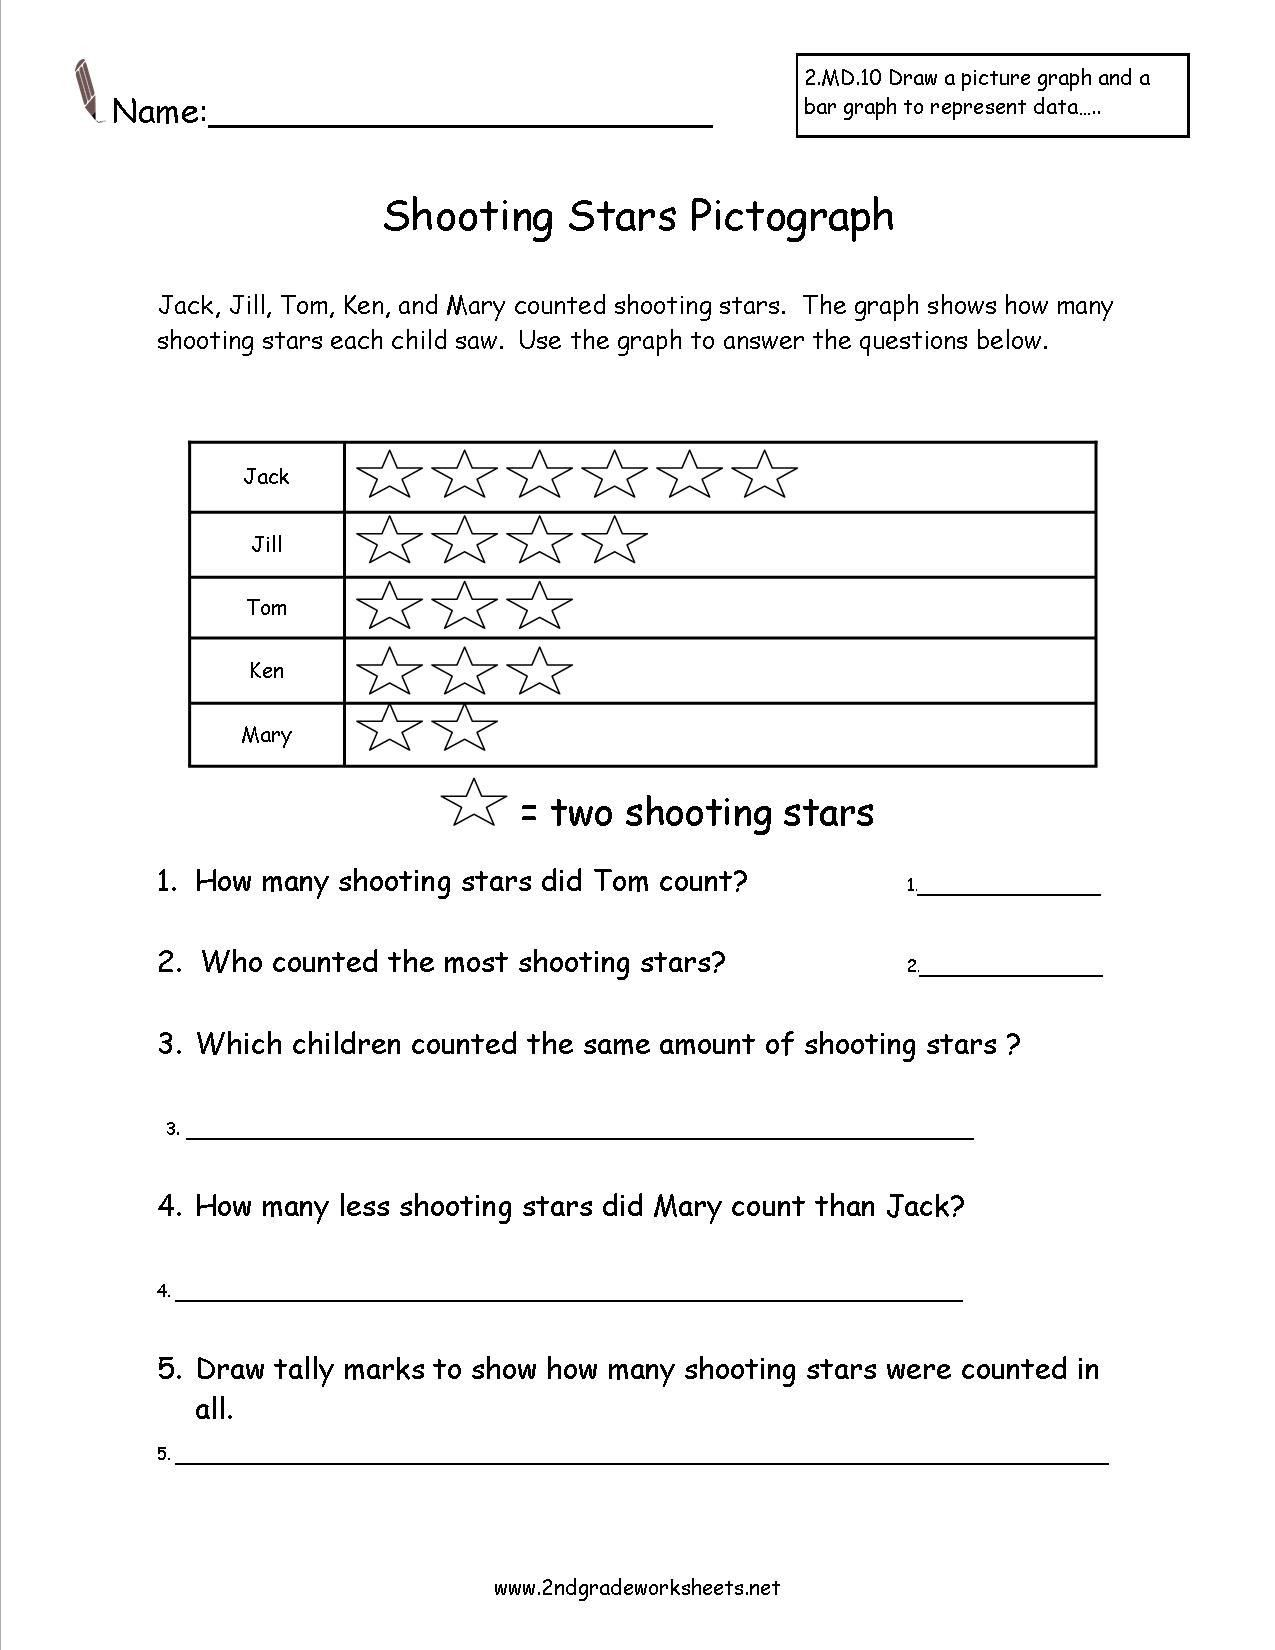 Second Grade Phonics Worksheets In 2020 Third Grade Worksheets 2nd Grade Worksheets Phonics Worksheets